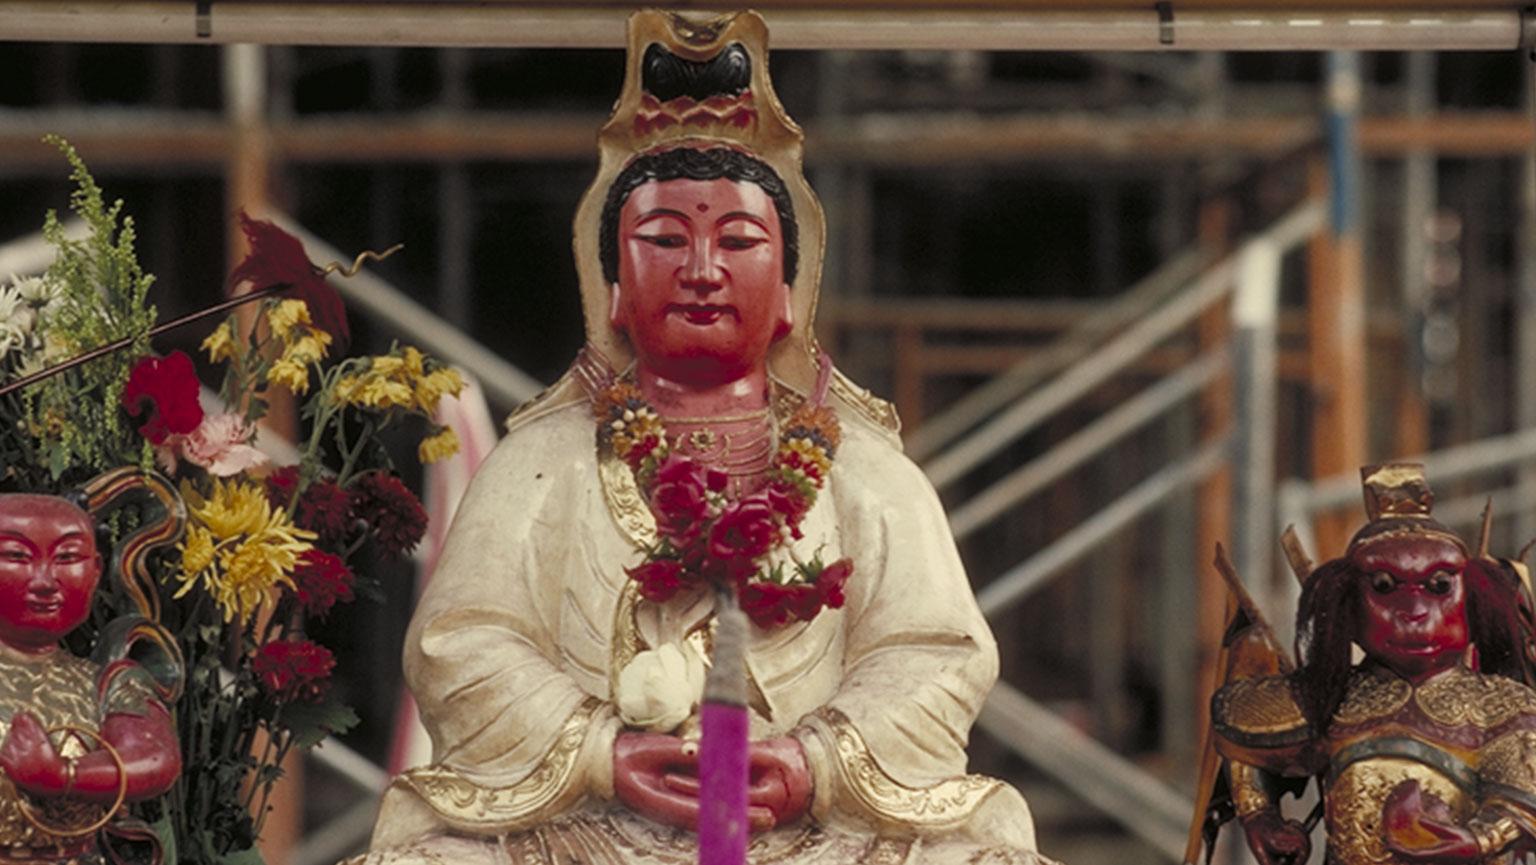 Celestial Buddhas and Bodhisattvas